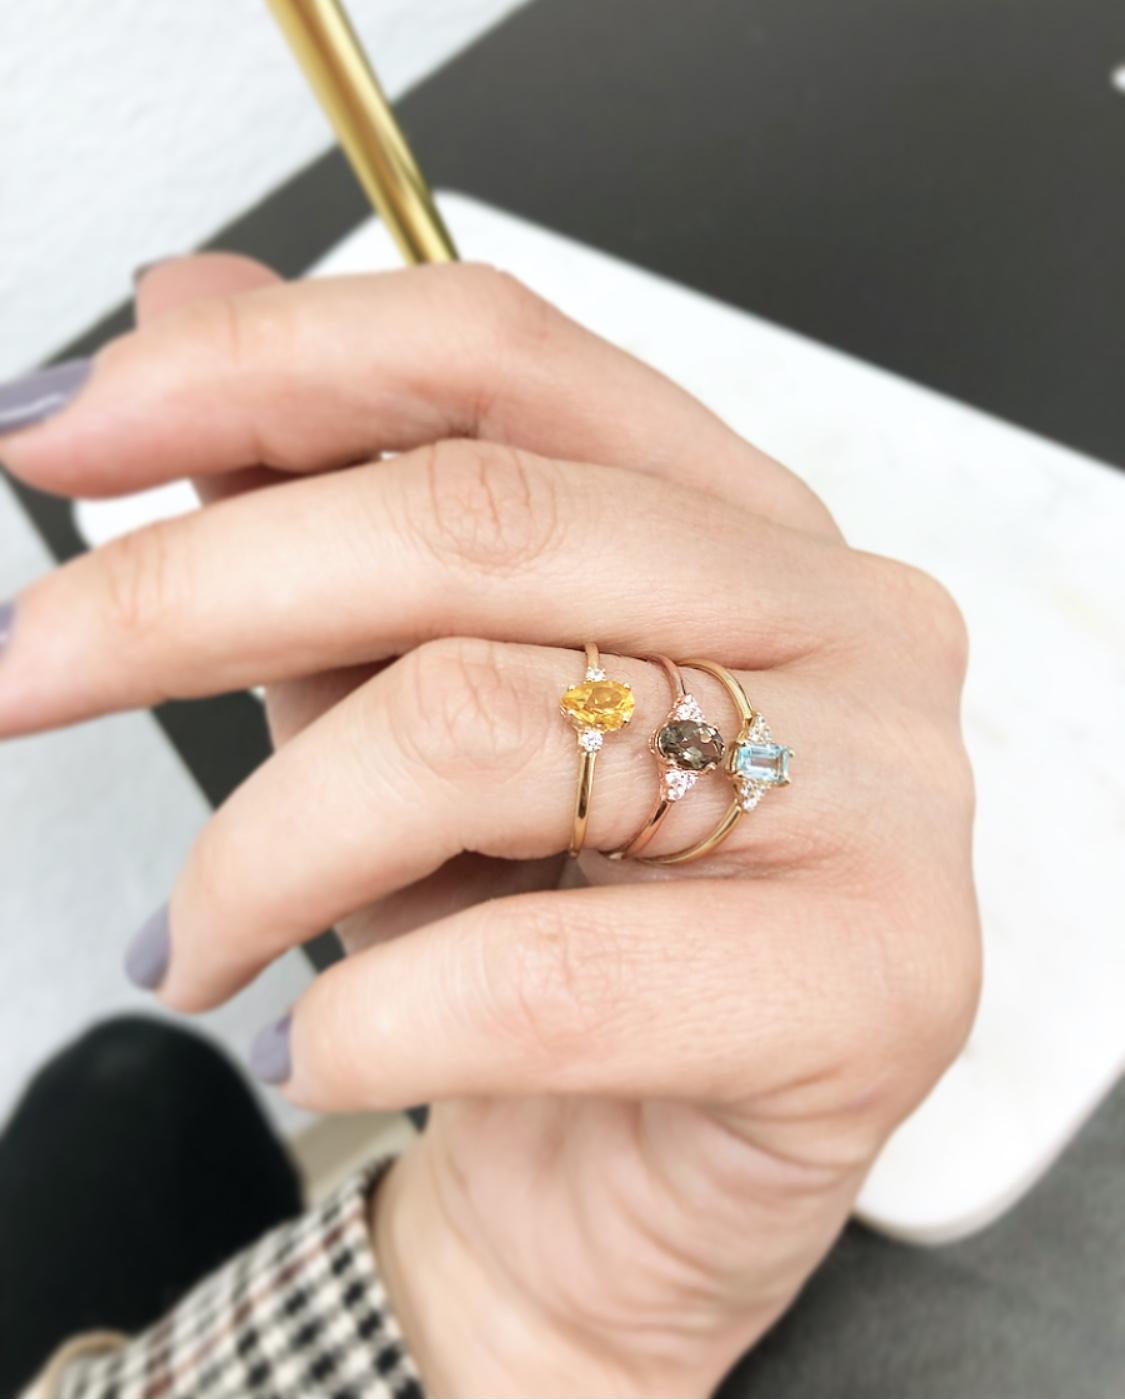 Anillo Oro 18kts Con Piedras Semipreciosas Y Diamantes Girbes Joyas